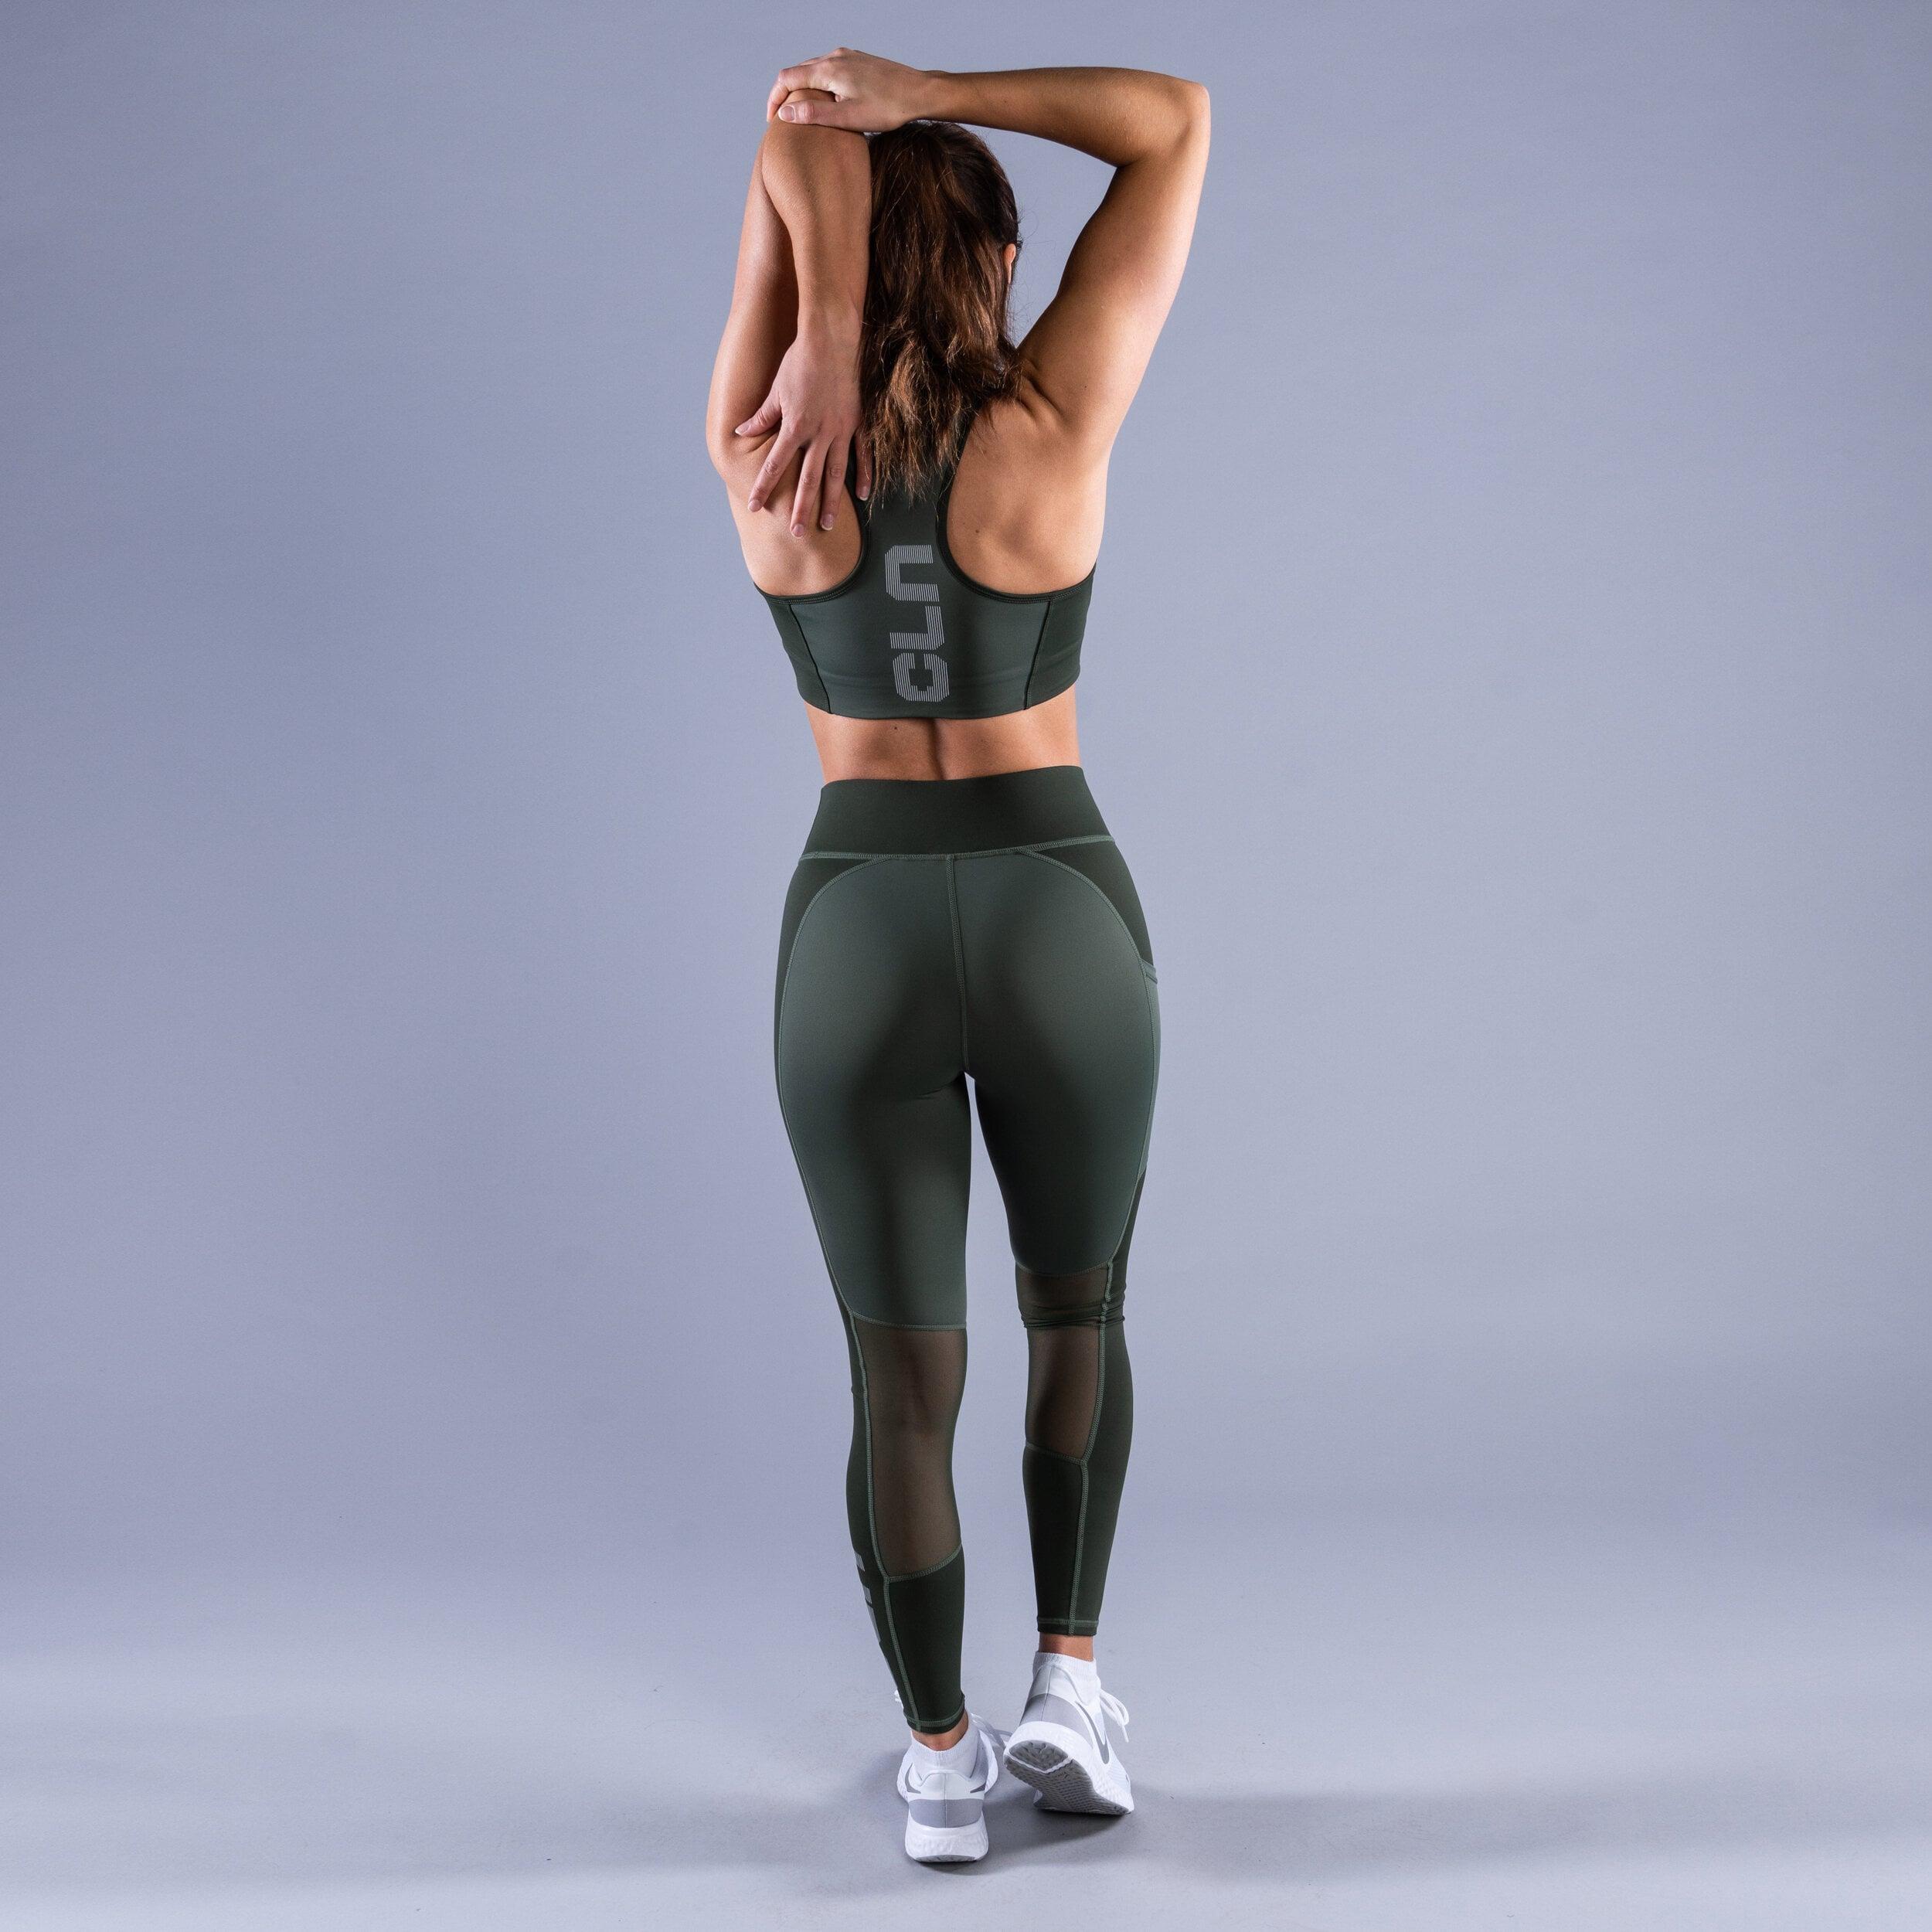 Package Freedom tights - Intense sport bra Green